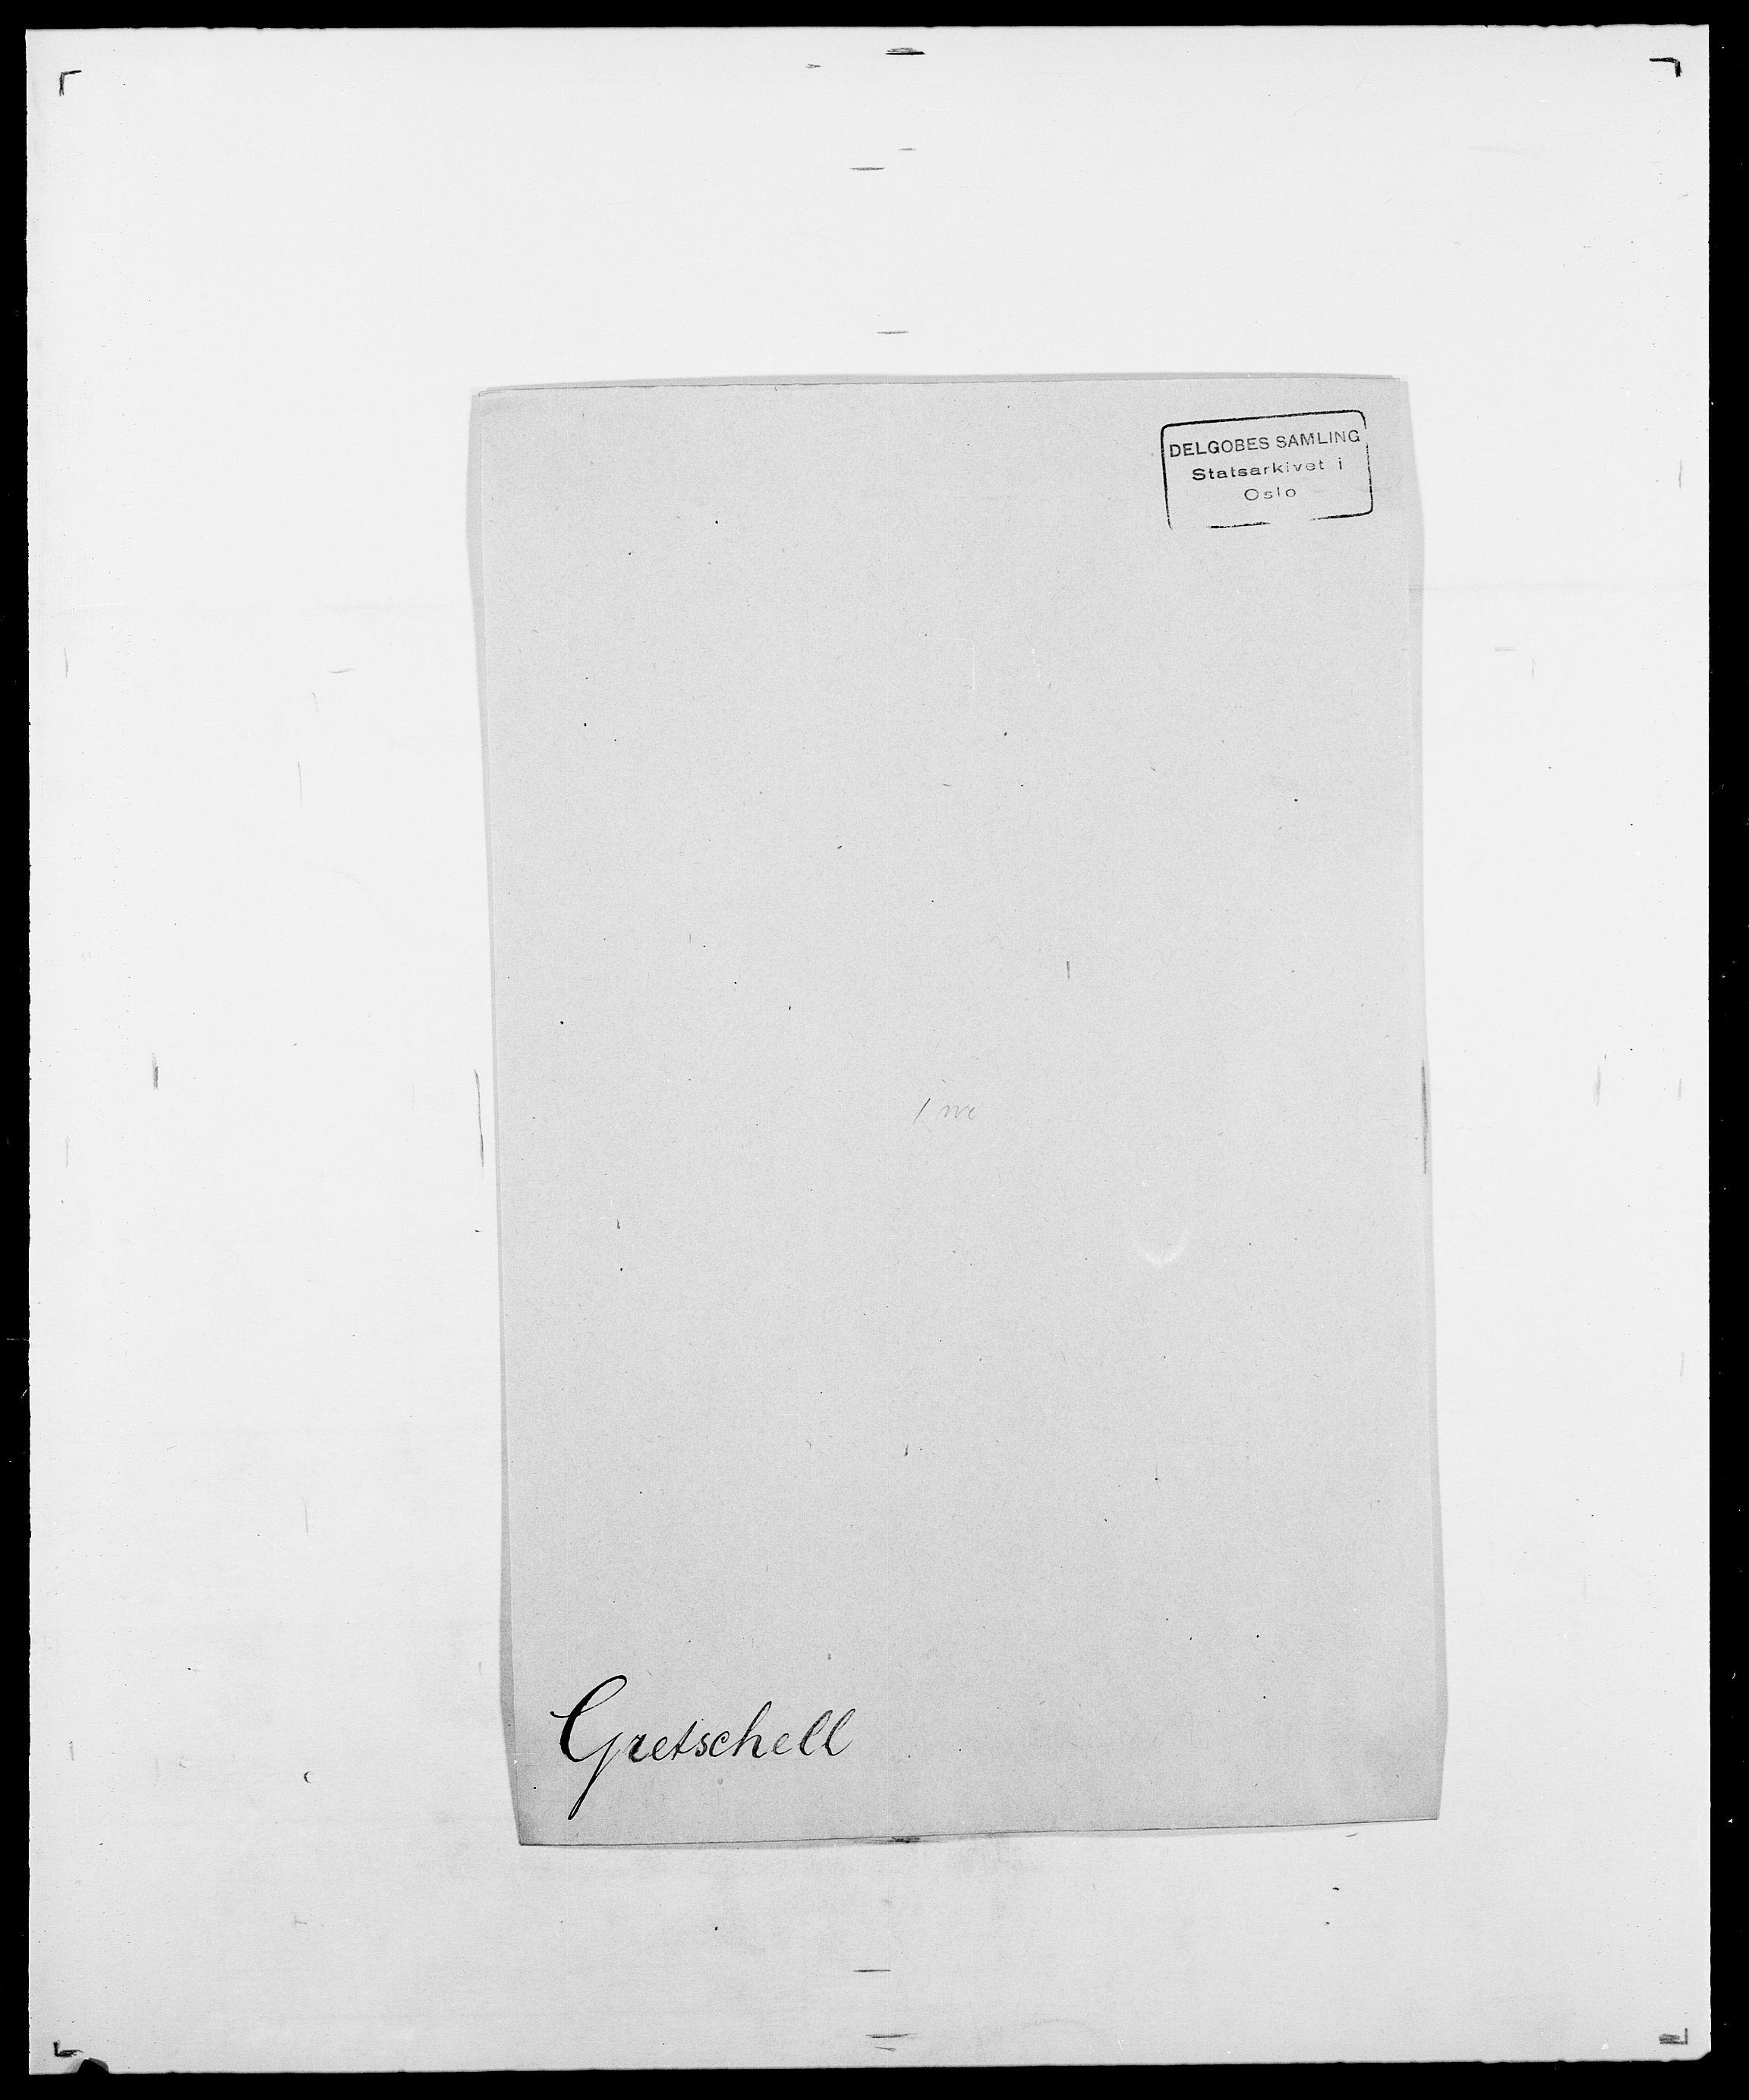 SAO, Delgobe, Charles Antoine - samling, D/Da/L0014: Giebdhausen - Grip, s. 608